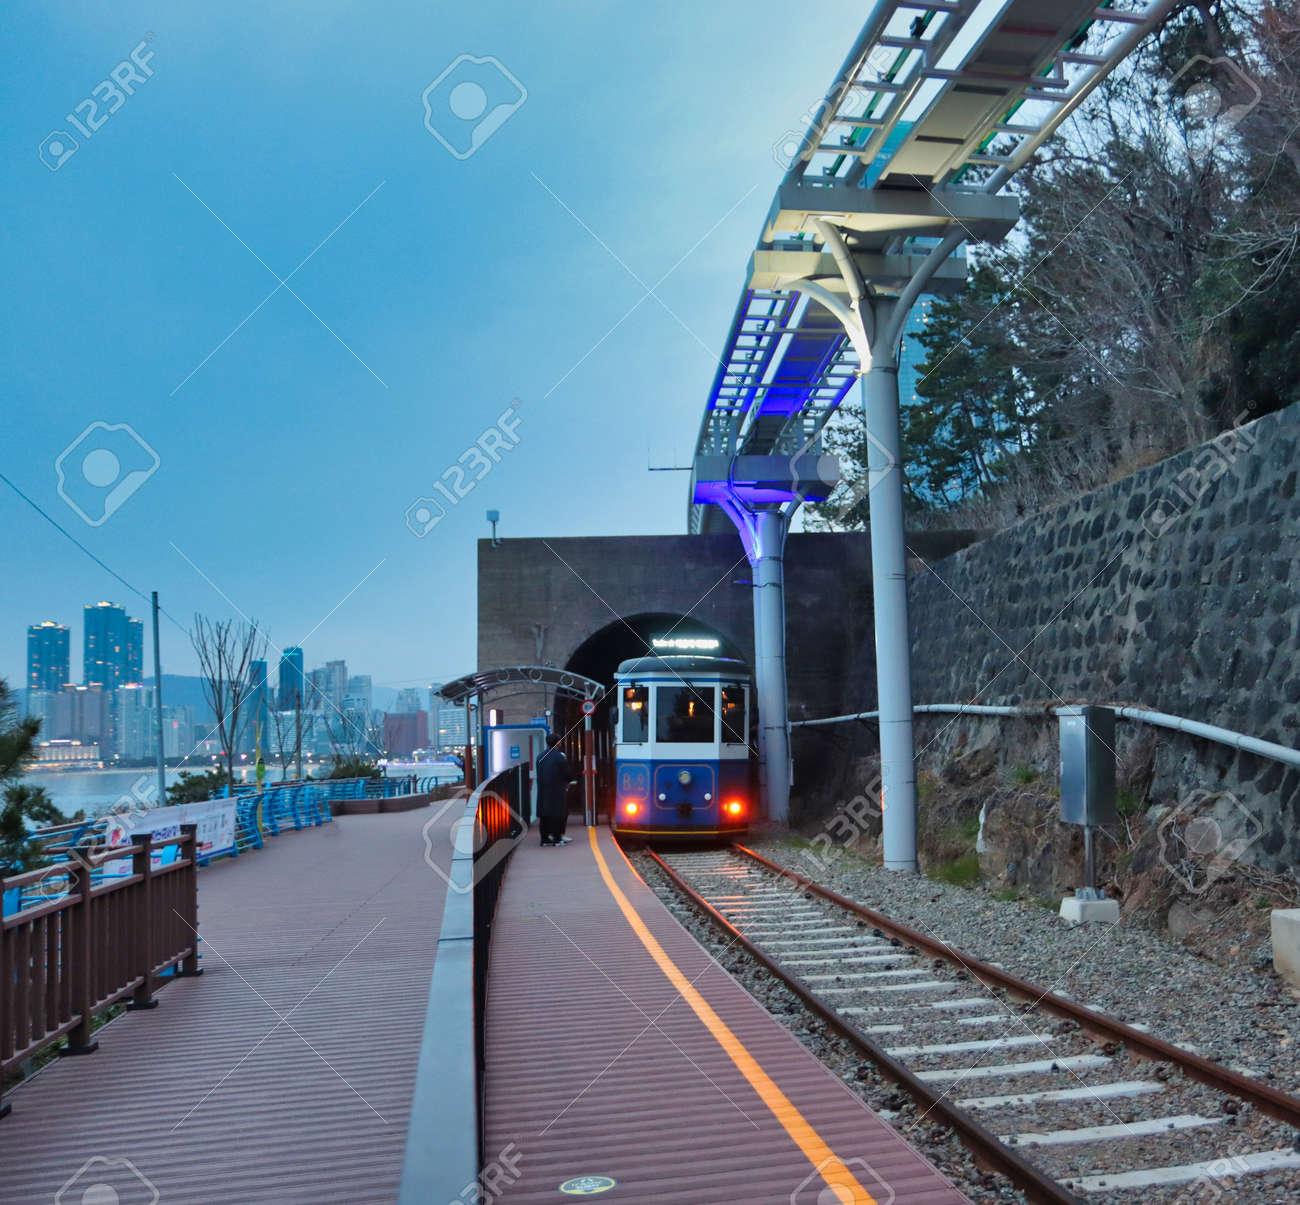 Scenery of Haeundae Beach Train, Busan, South Korea, Asia. - 166088469